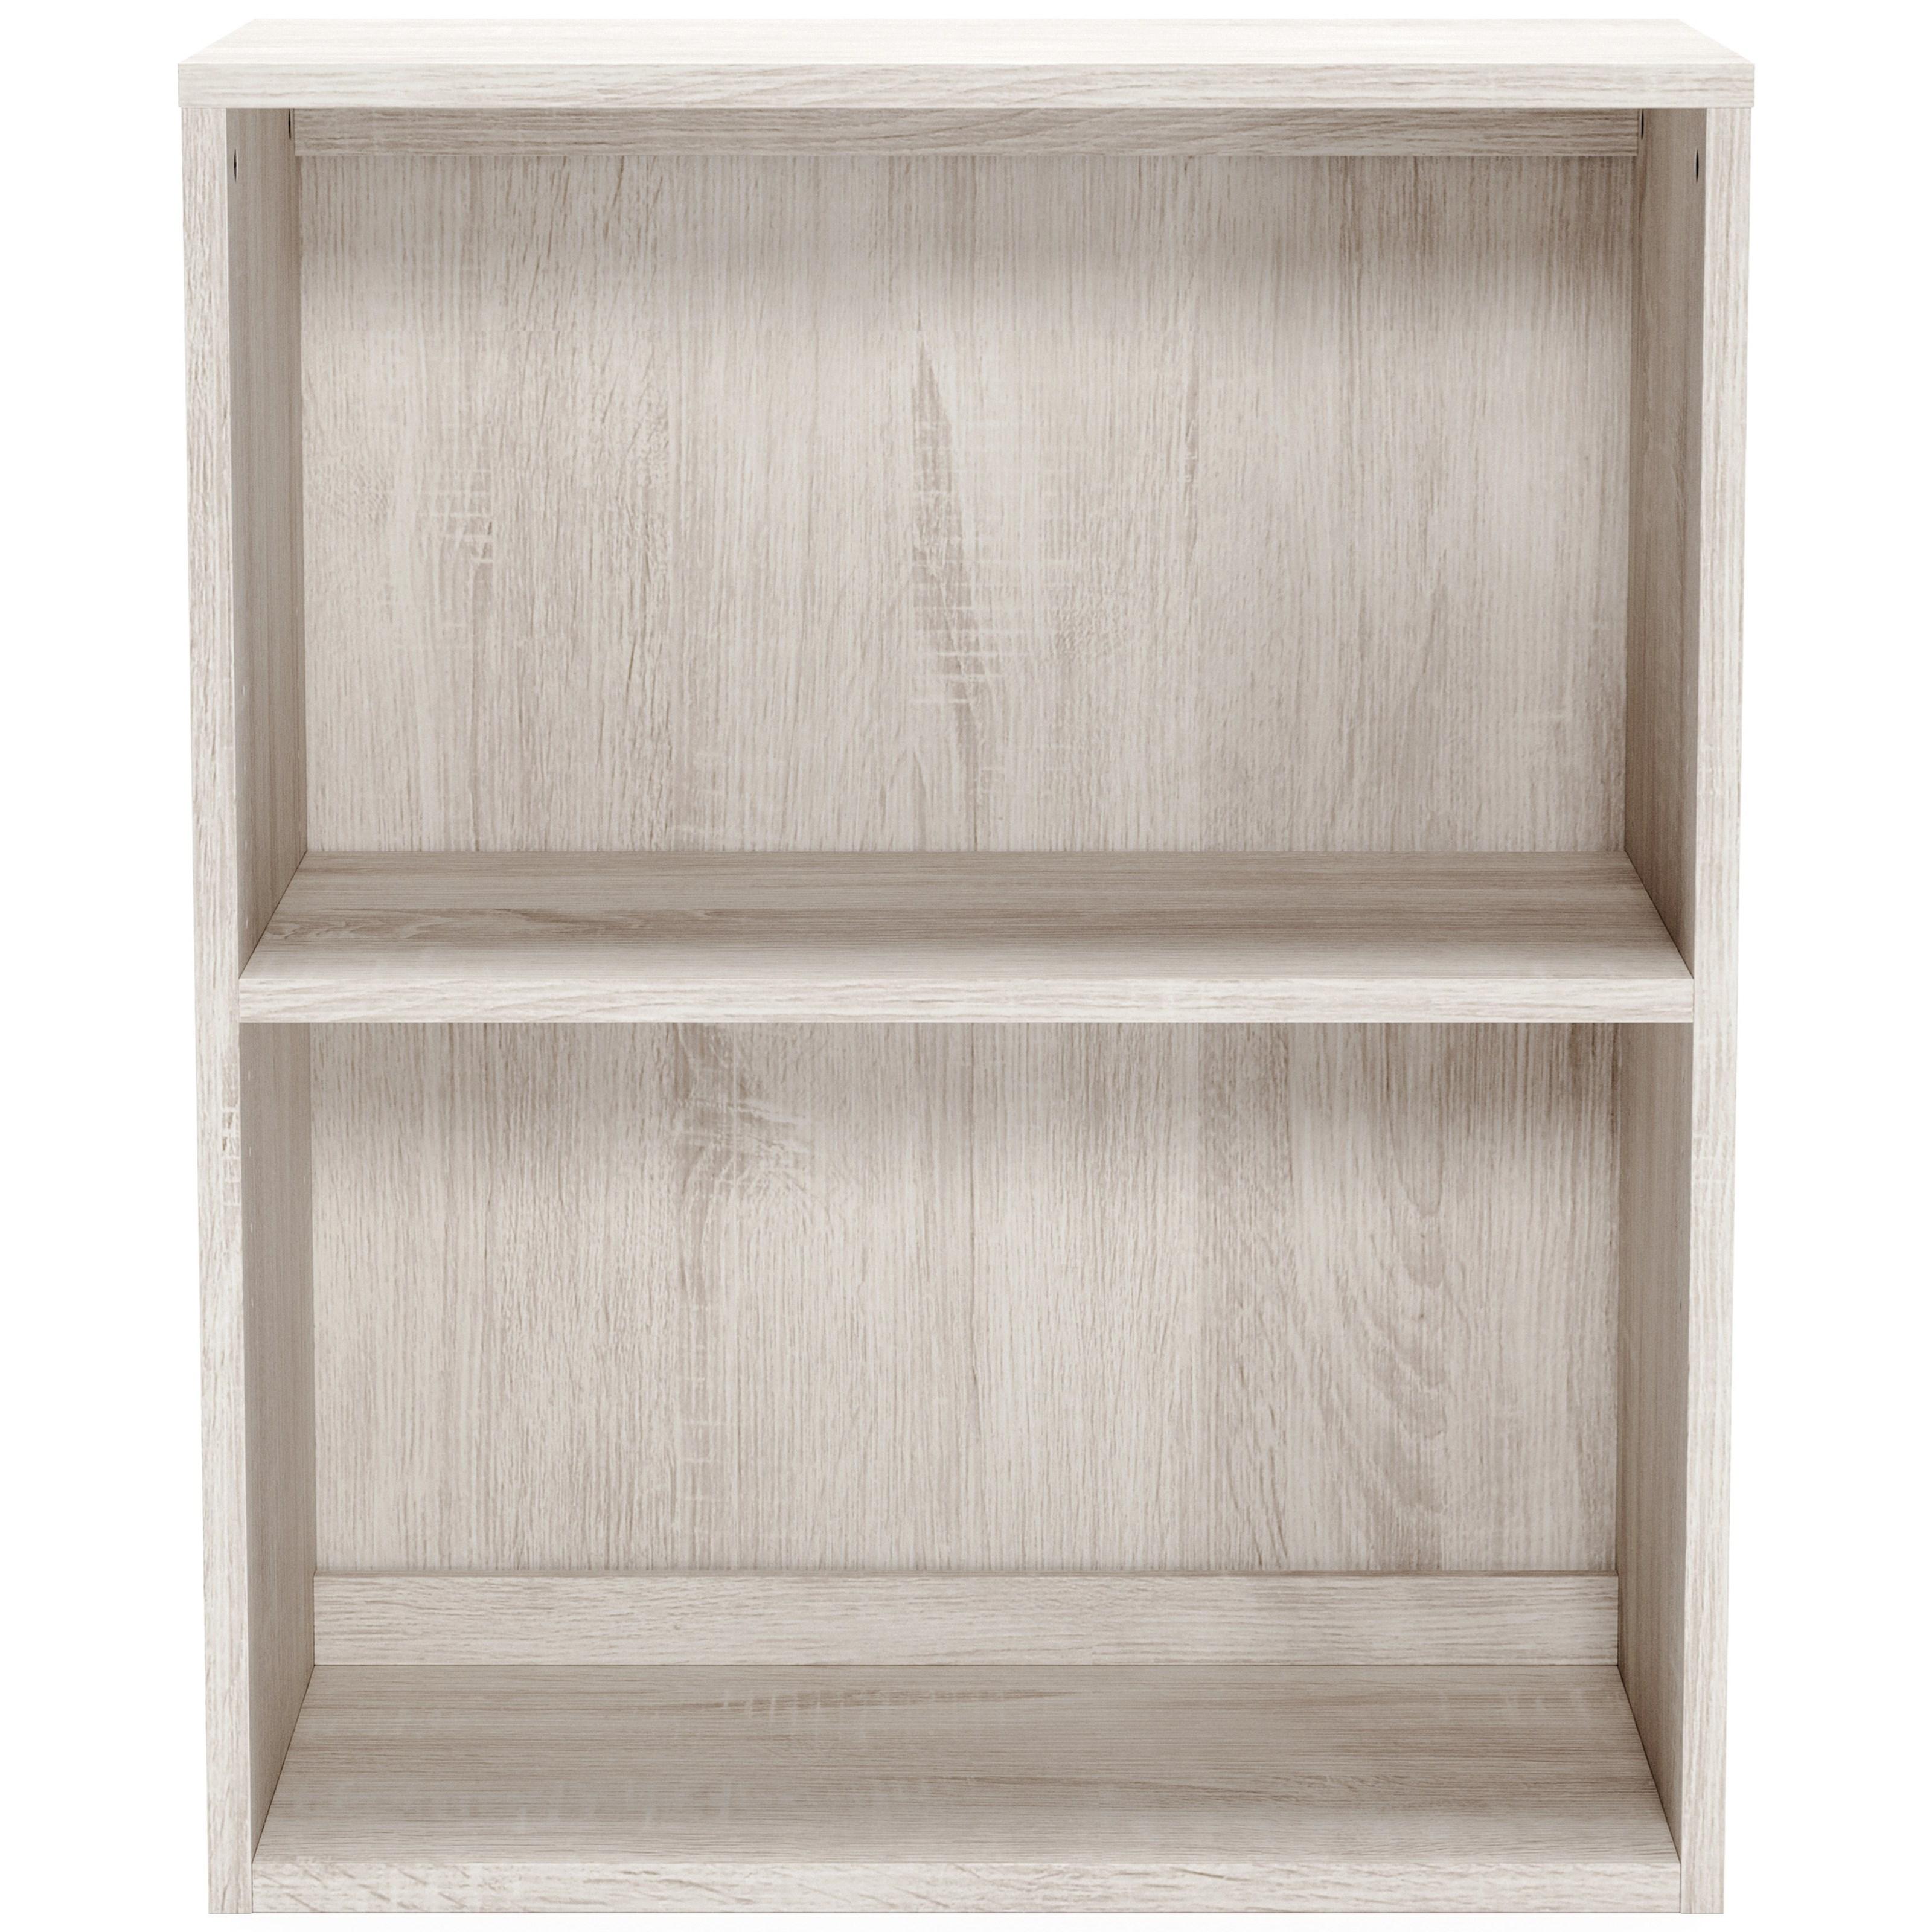 "Dorrinson 30"" Bookcase by Ashley (Signature Design) at Johnny Janosik"